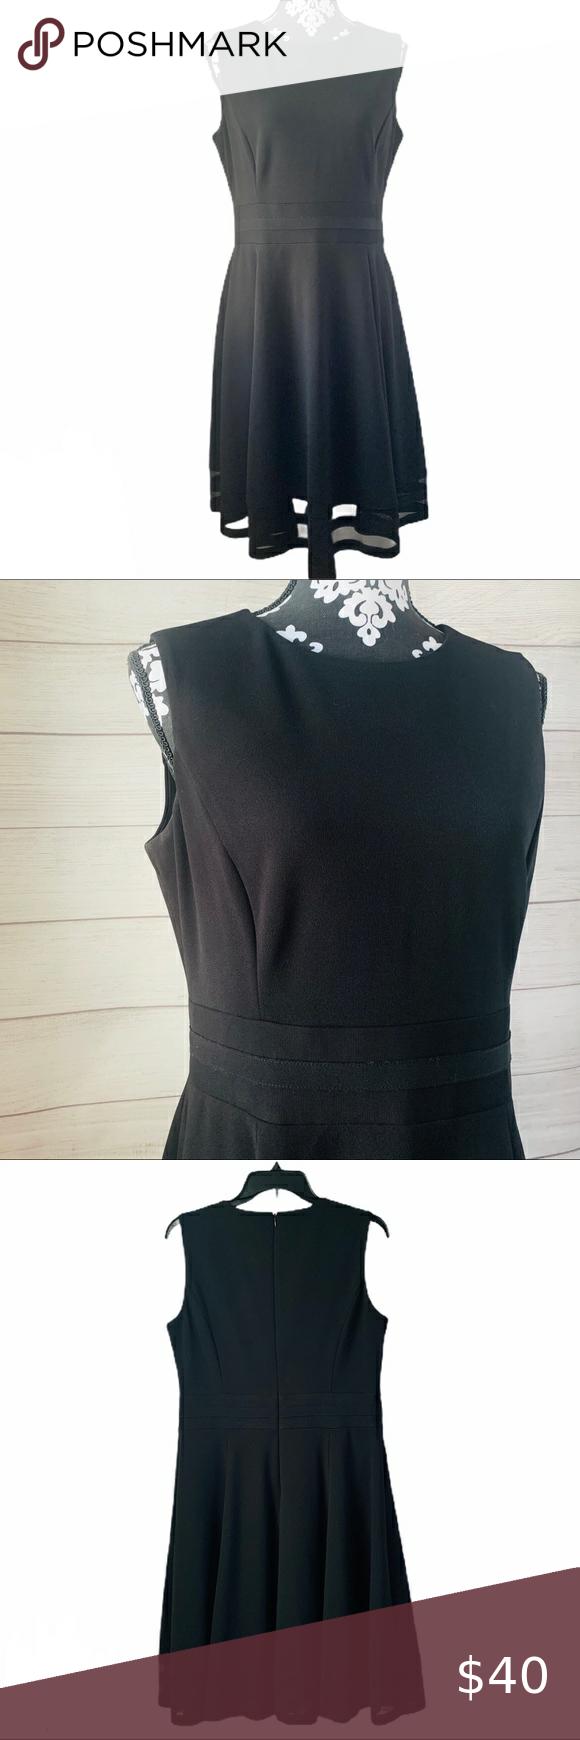 Calvin Klein Fit Flare Black Dress Size 12 Black Dress Clothes Design Fit Flare [ 1740 x 580 Pixel ]